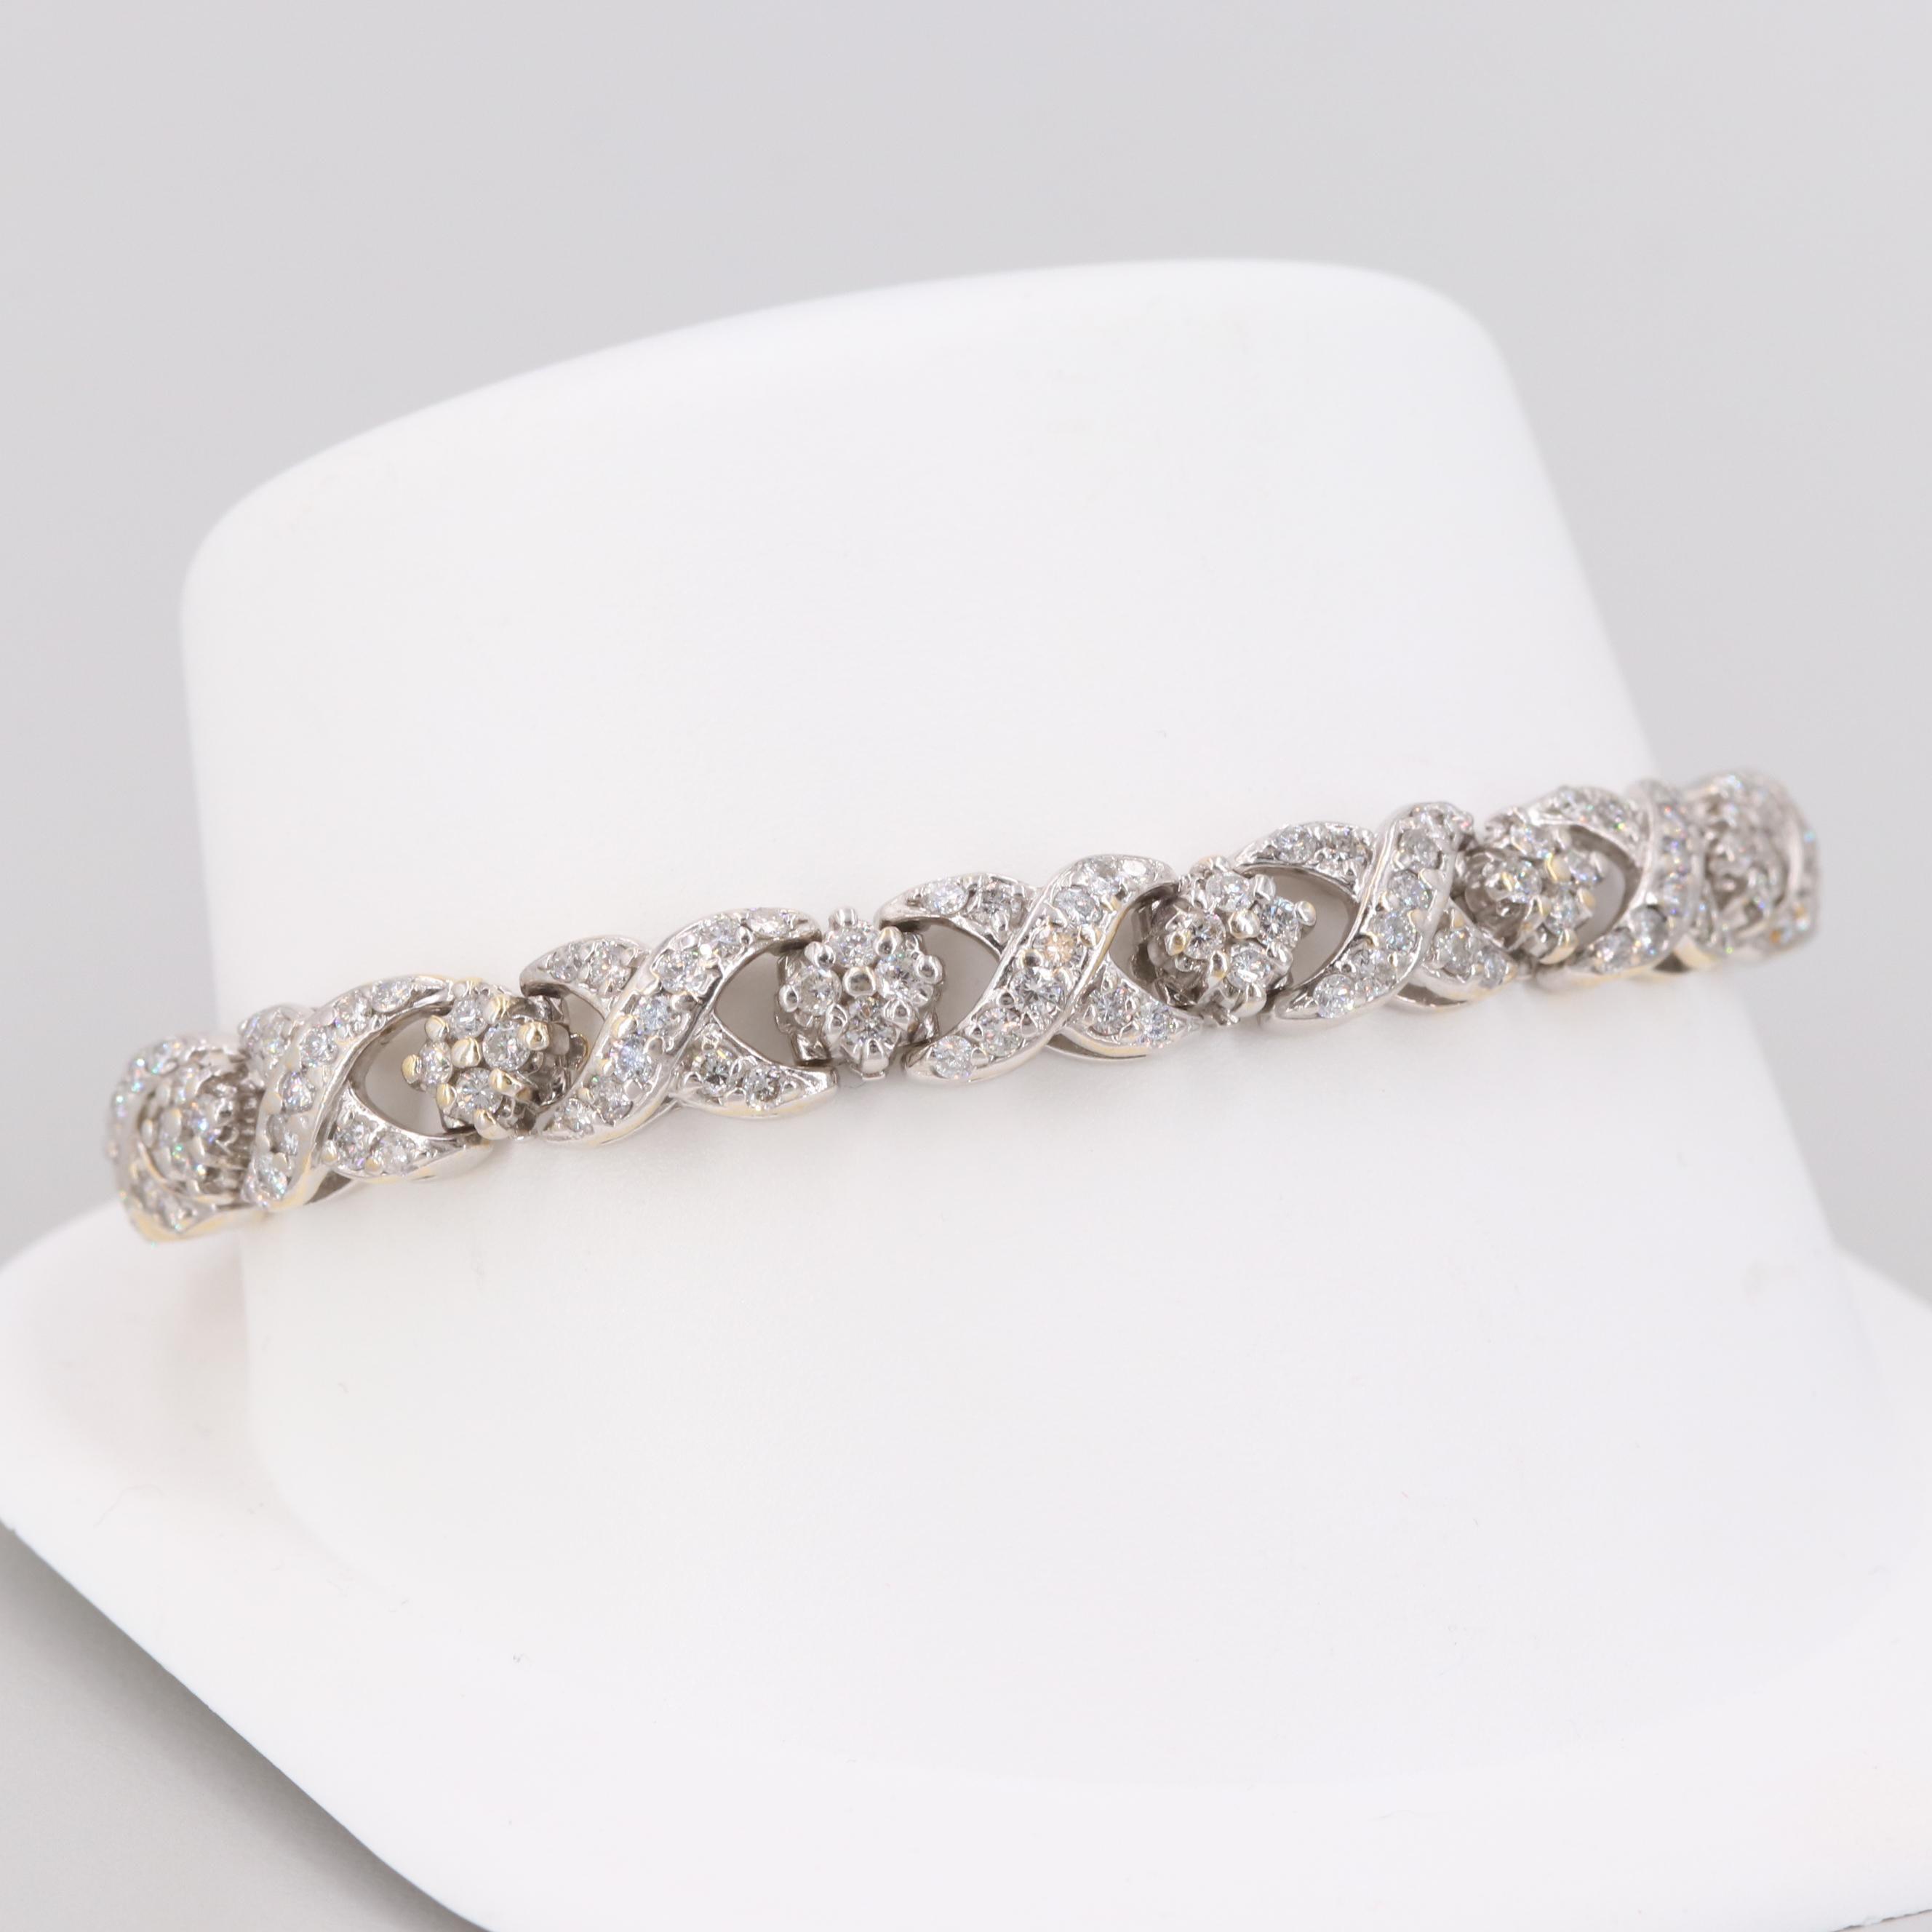 18K White Gold 5.02 CTW Diamond Bracelet